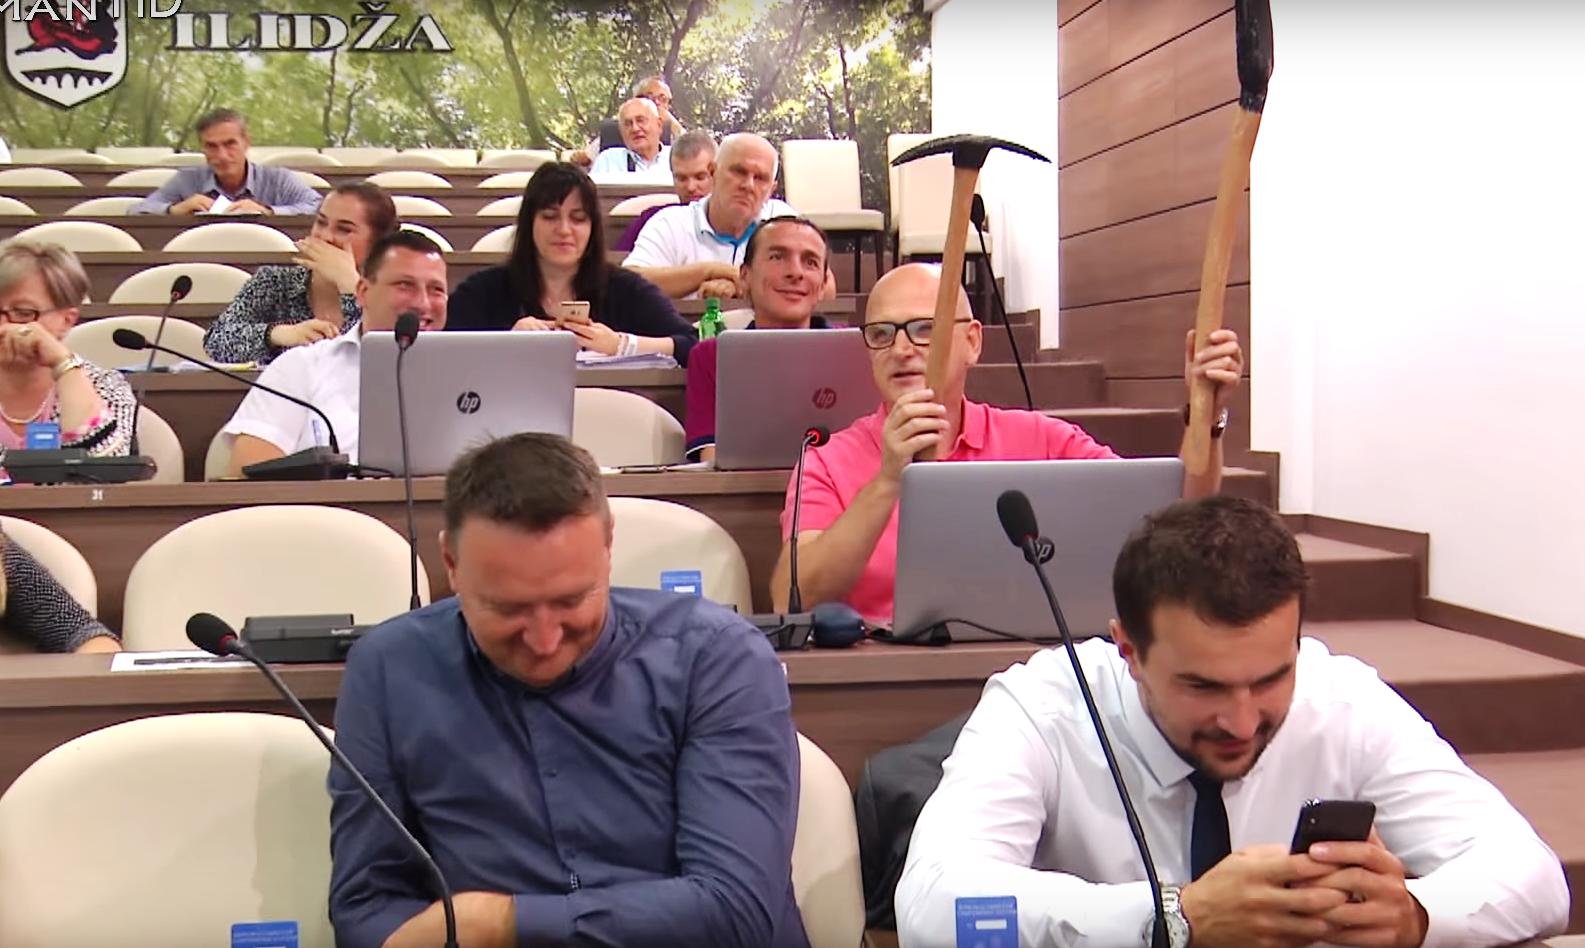 Vijećnik DF-a Nedžad Tinjak poklonio krampu i lopatu načelniku Ilidže Memiću